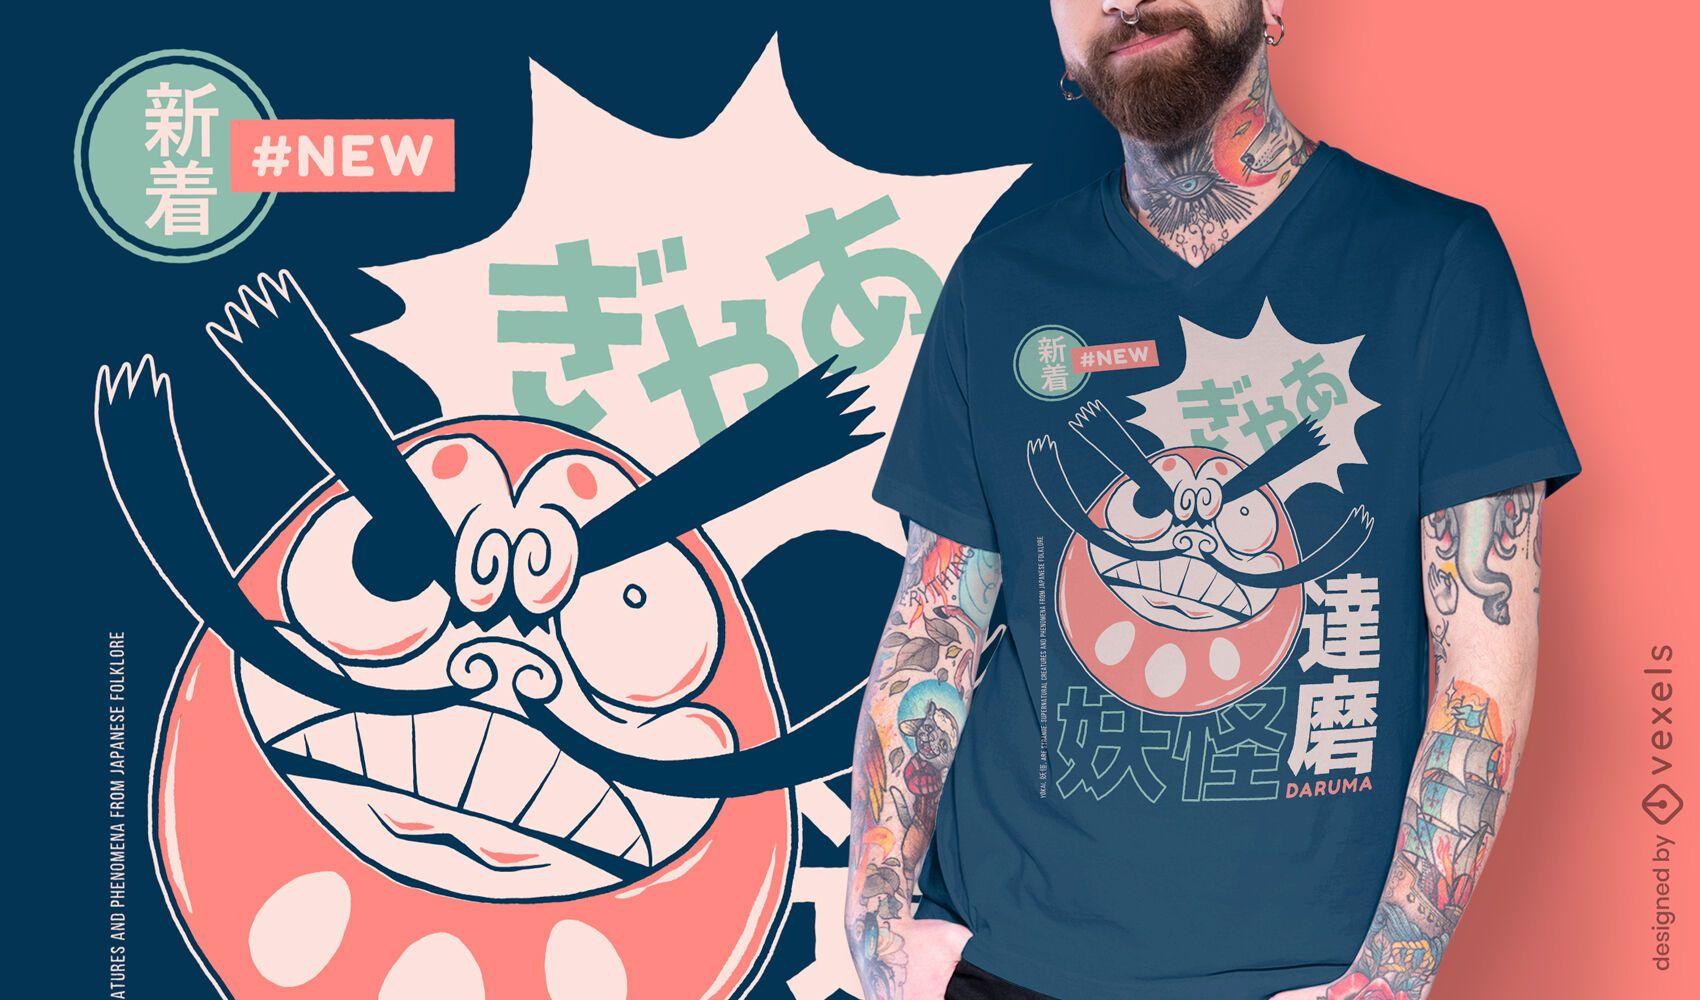 Daruma japanisches Yokai T-Shirt Design